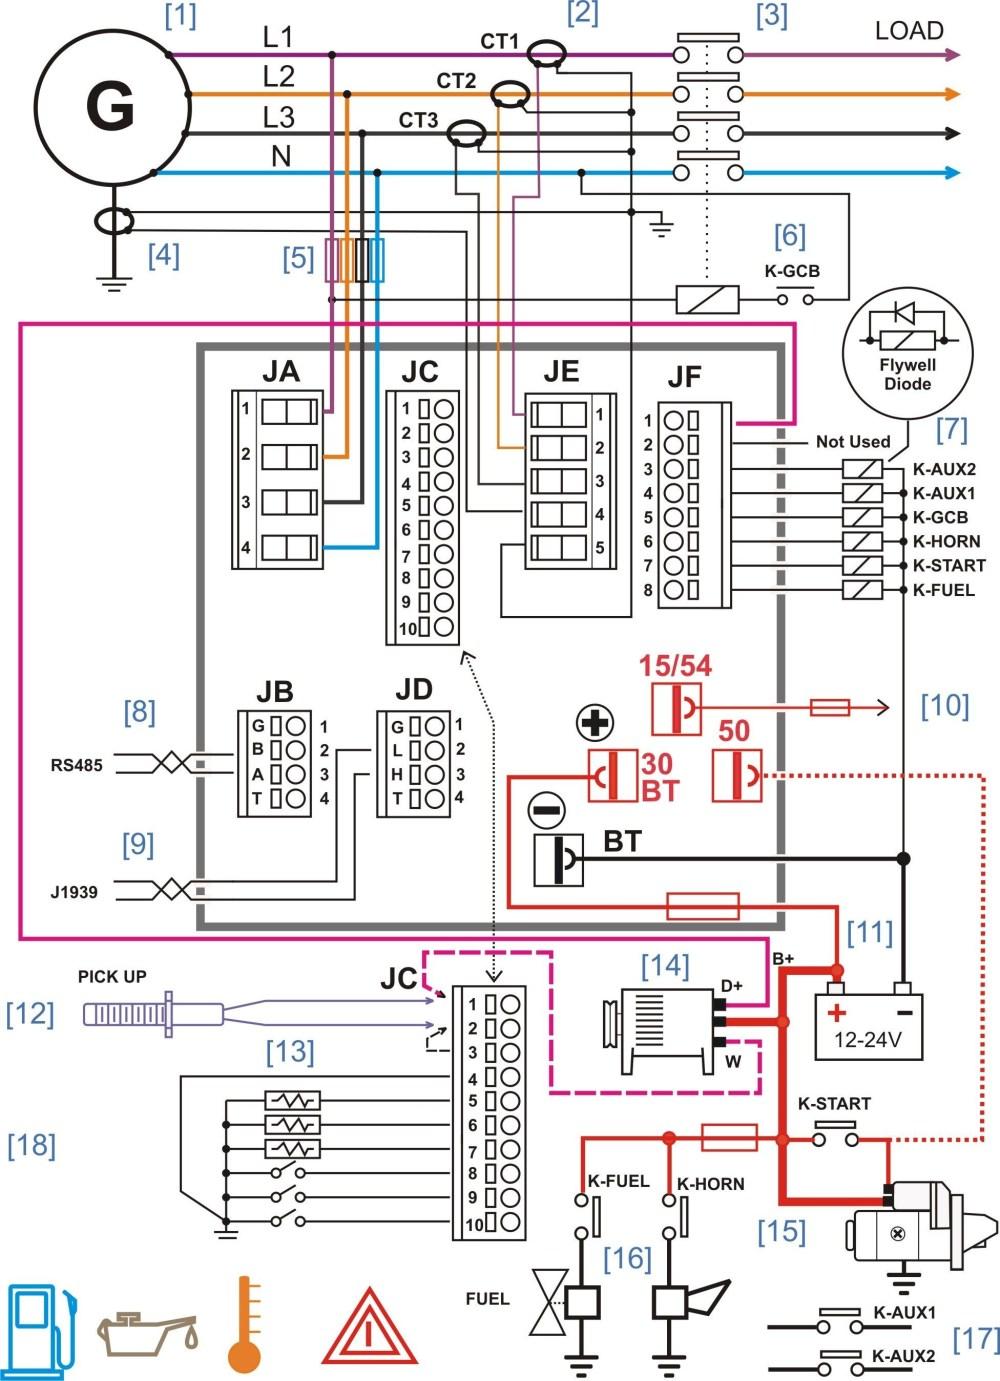 medium resolution of 5 4 triton engine diagram diesel generator control panel wiring diagram of 5 4 triton engine